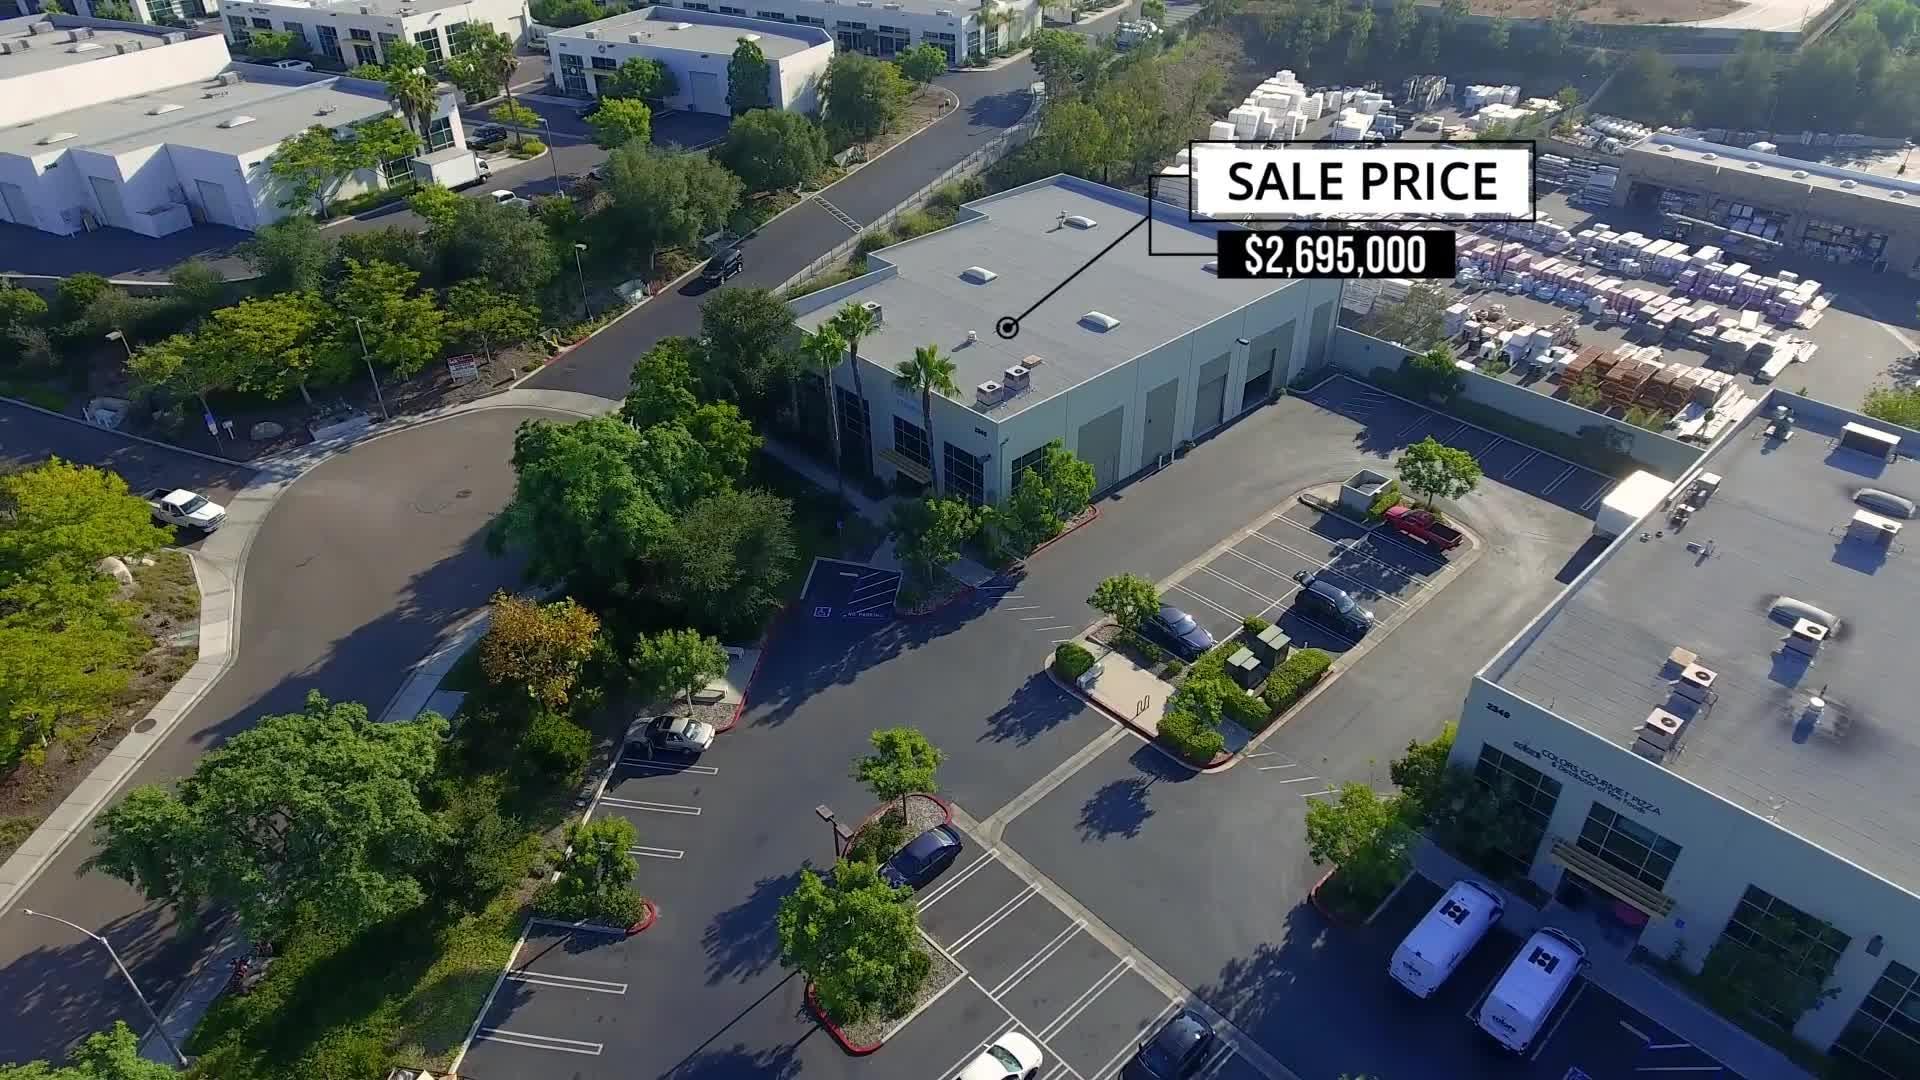 Commercial Real Estate-Vista